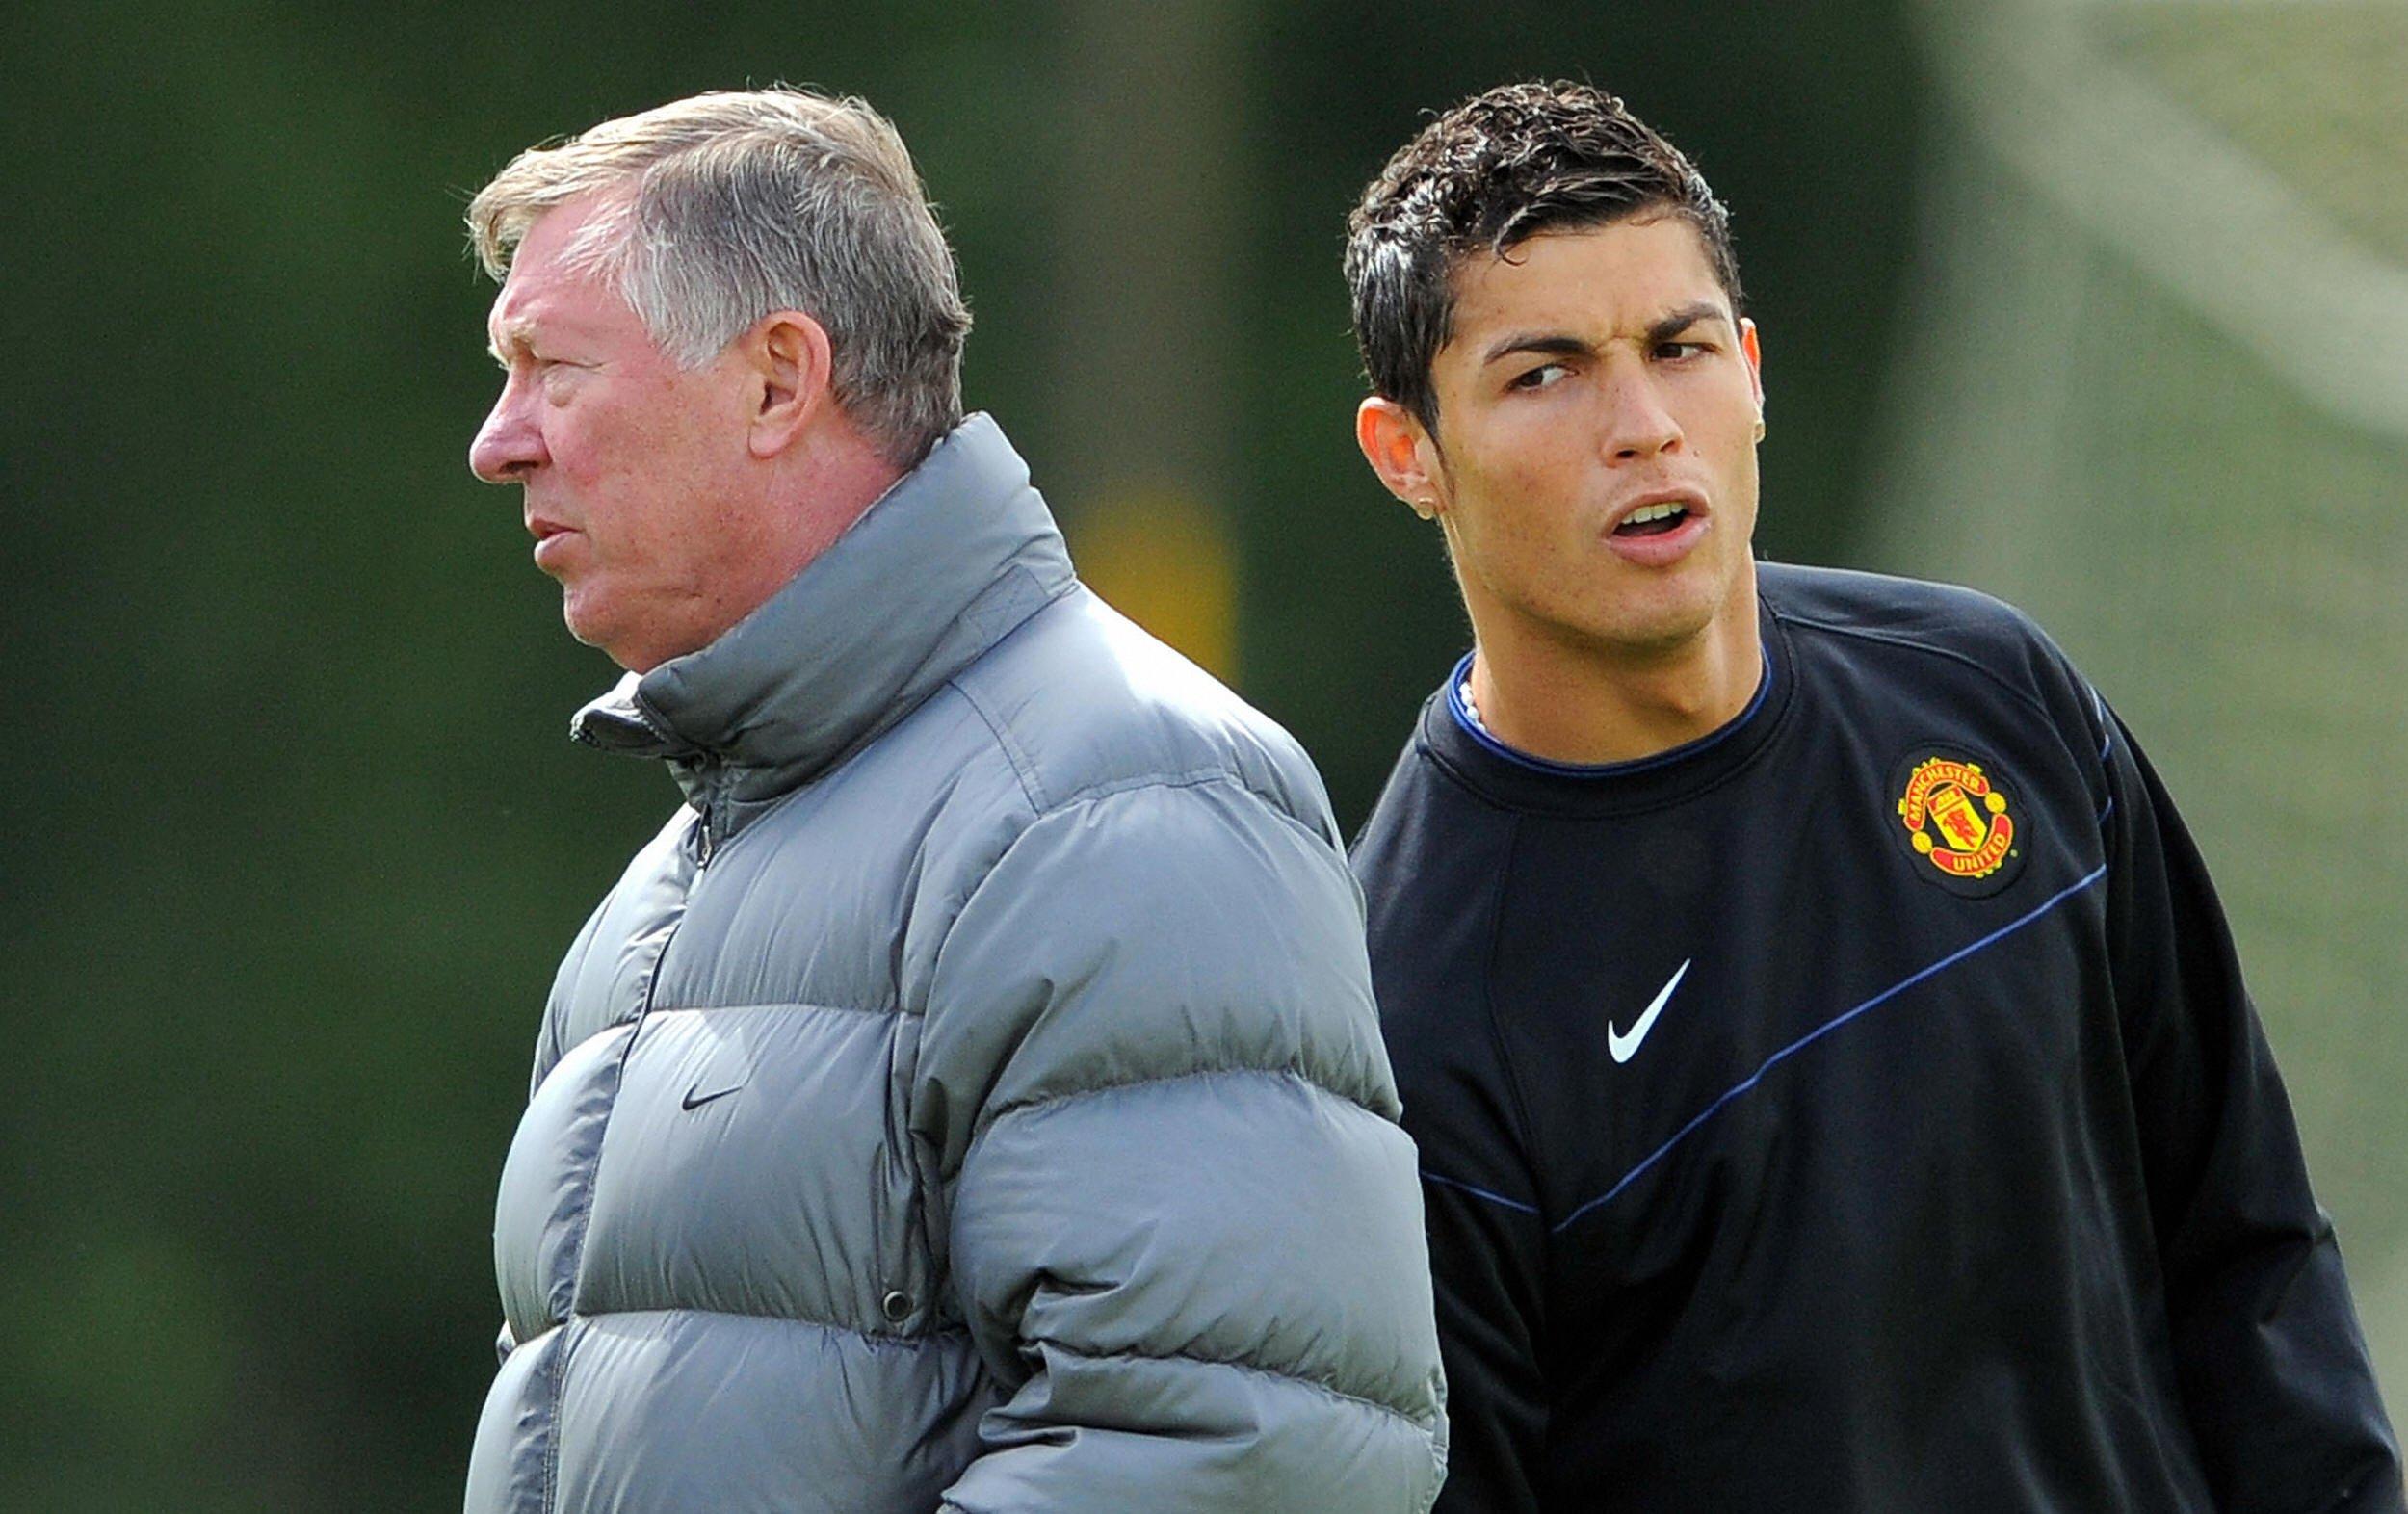 Sir Alex Ferguson, left, with former Manchester United star Cristiano Ronaldo.